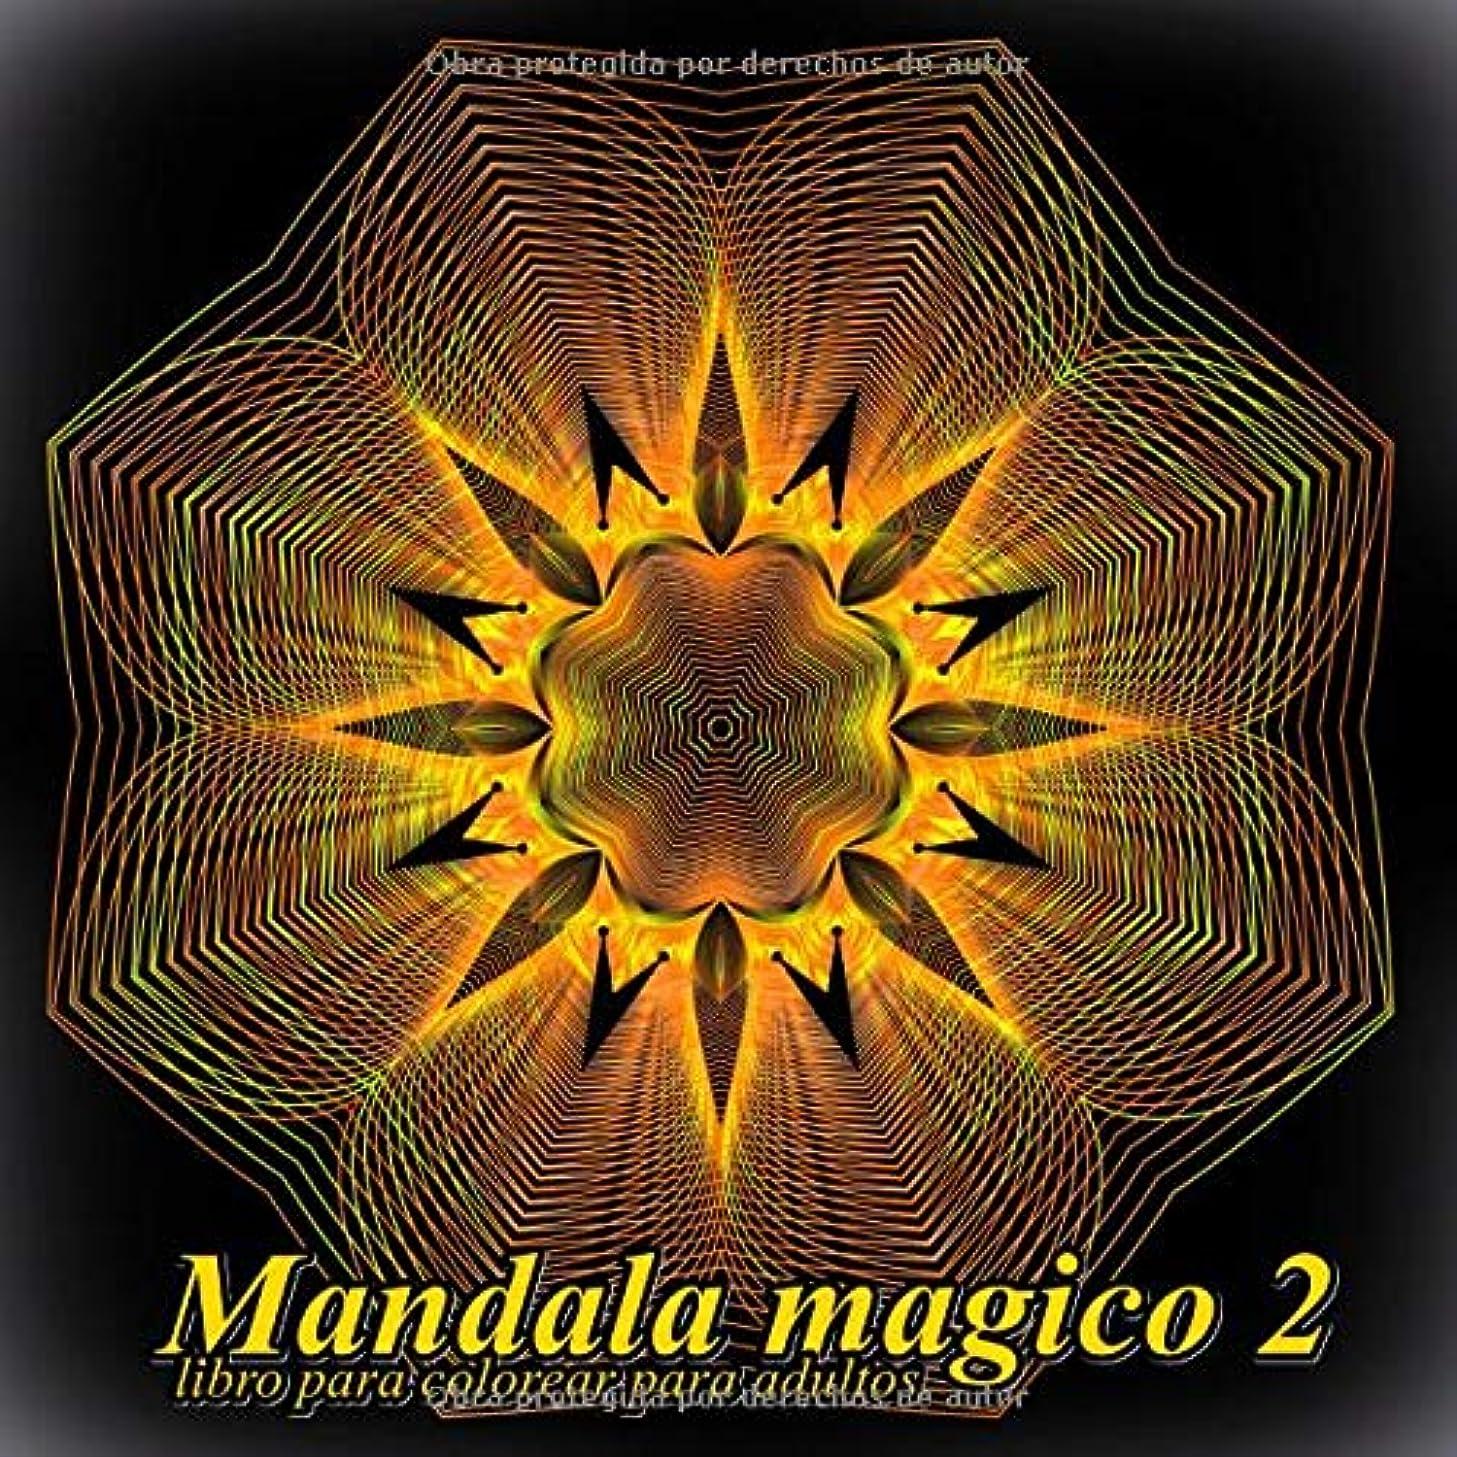 Mandala magico 2: libro para colorear para adultos (Volume 2) (Spanish Edition)